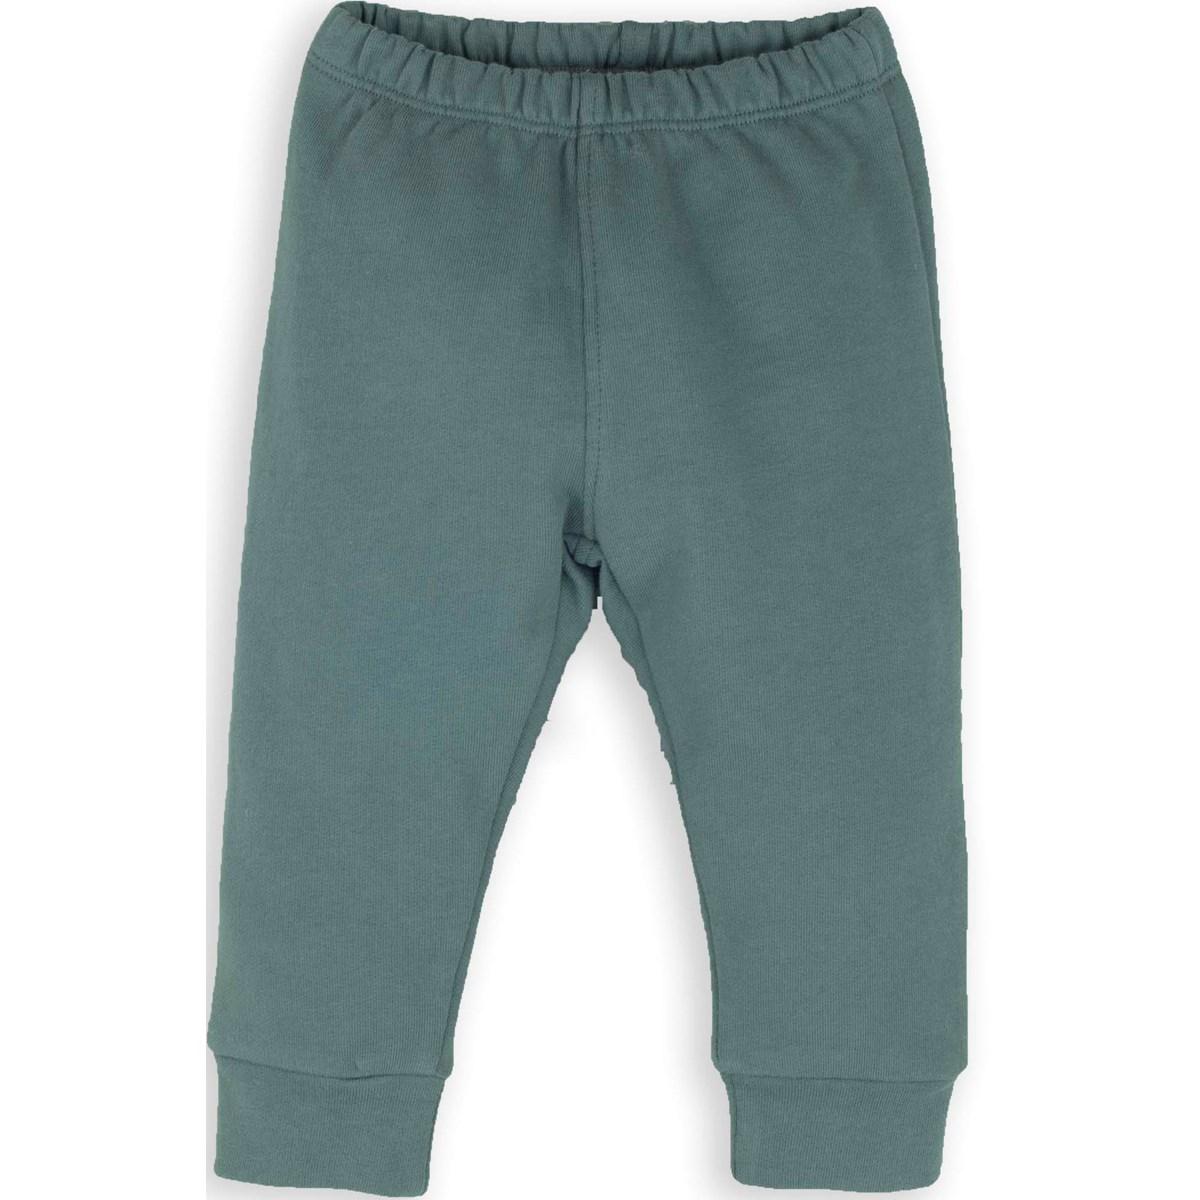 13836 Erkek pijama Takim 5